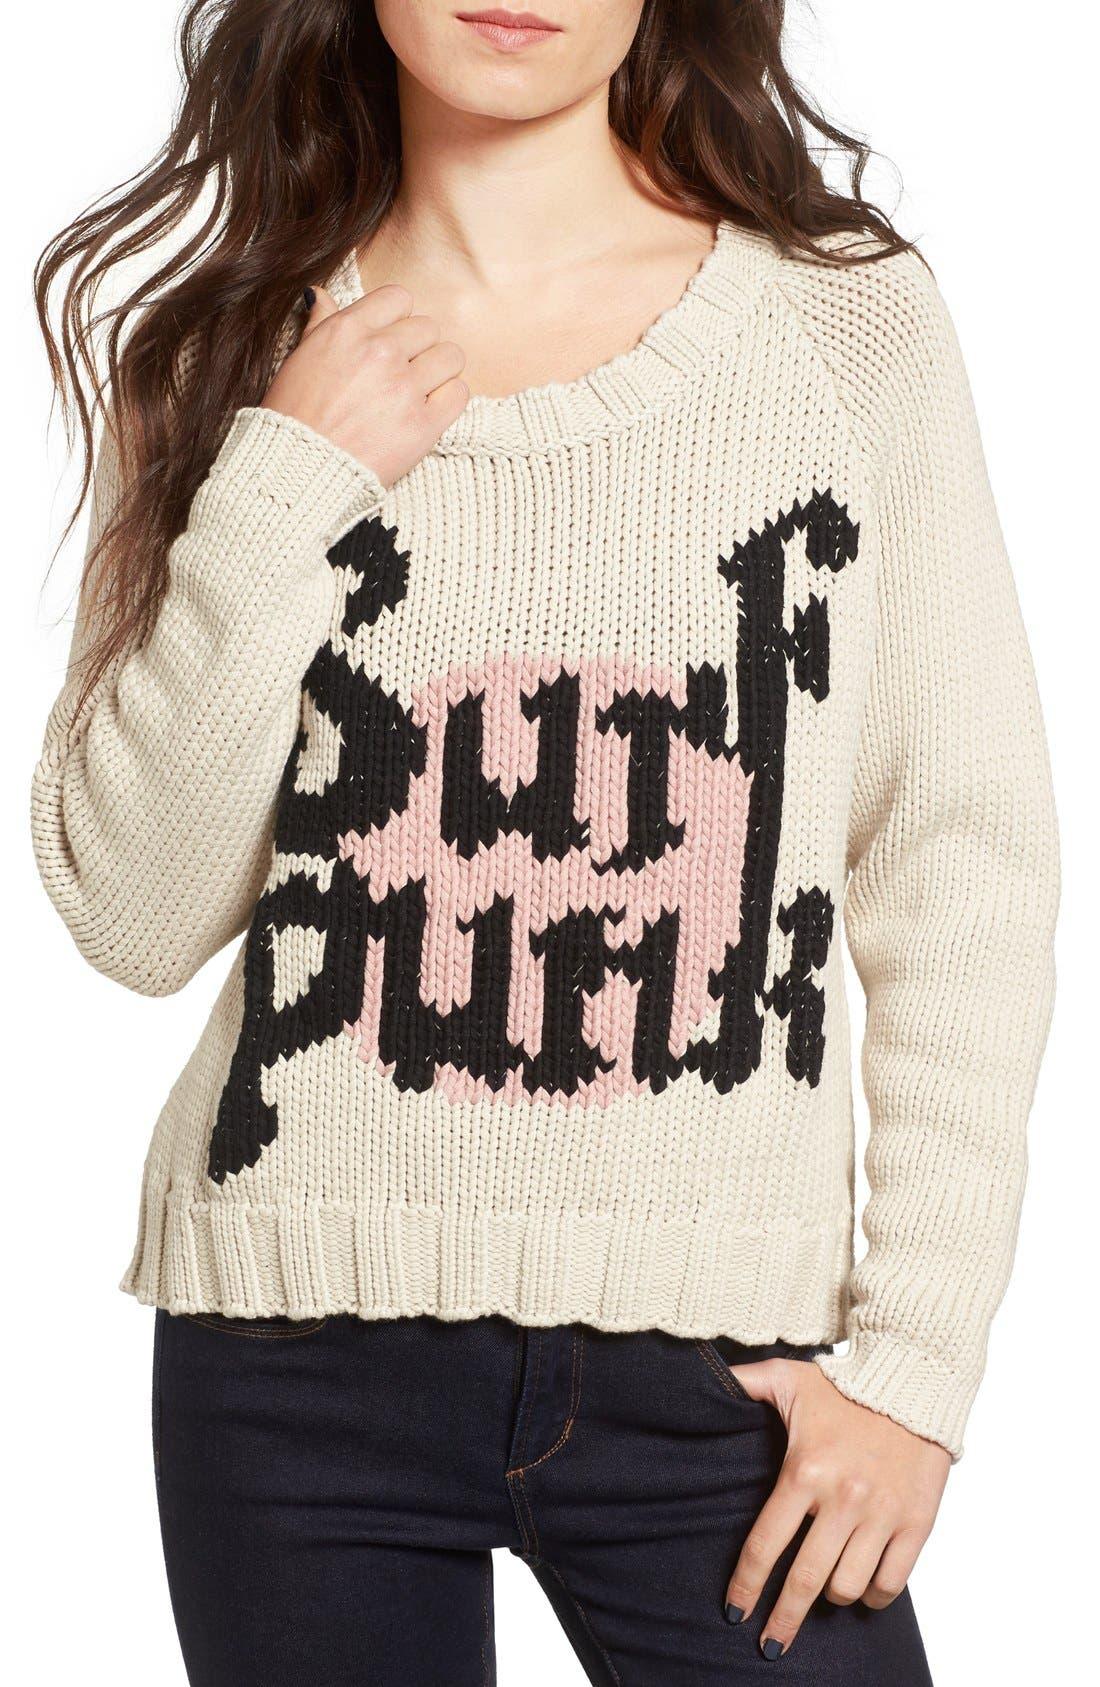 Main Image - One Teaspoon Surf Punk Intarsia Knit Sweater